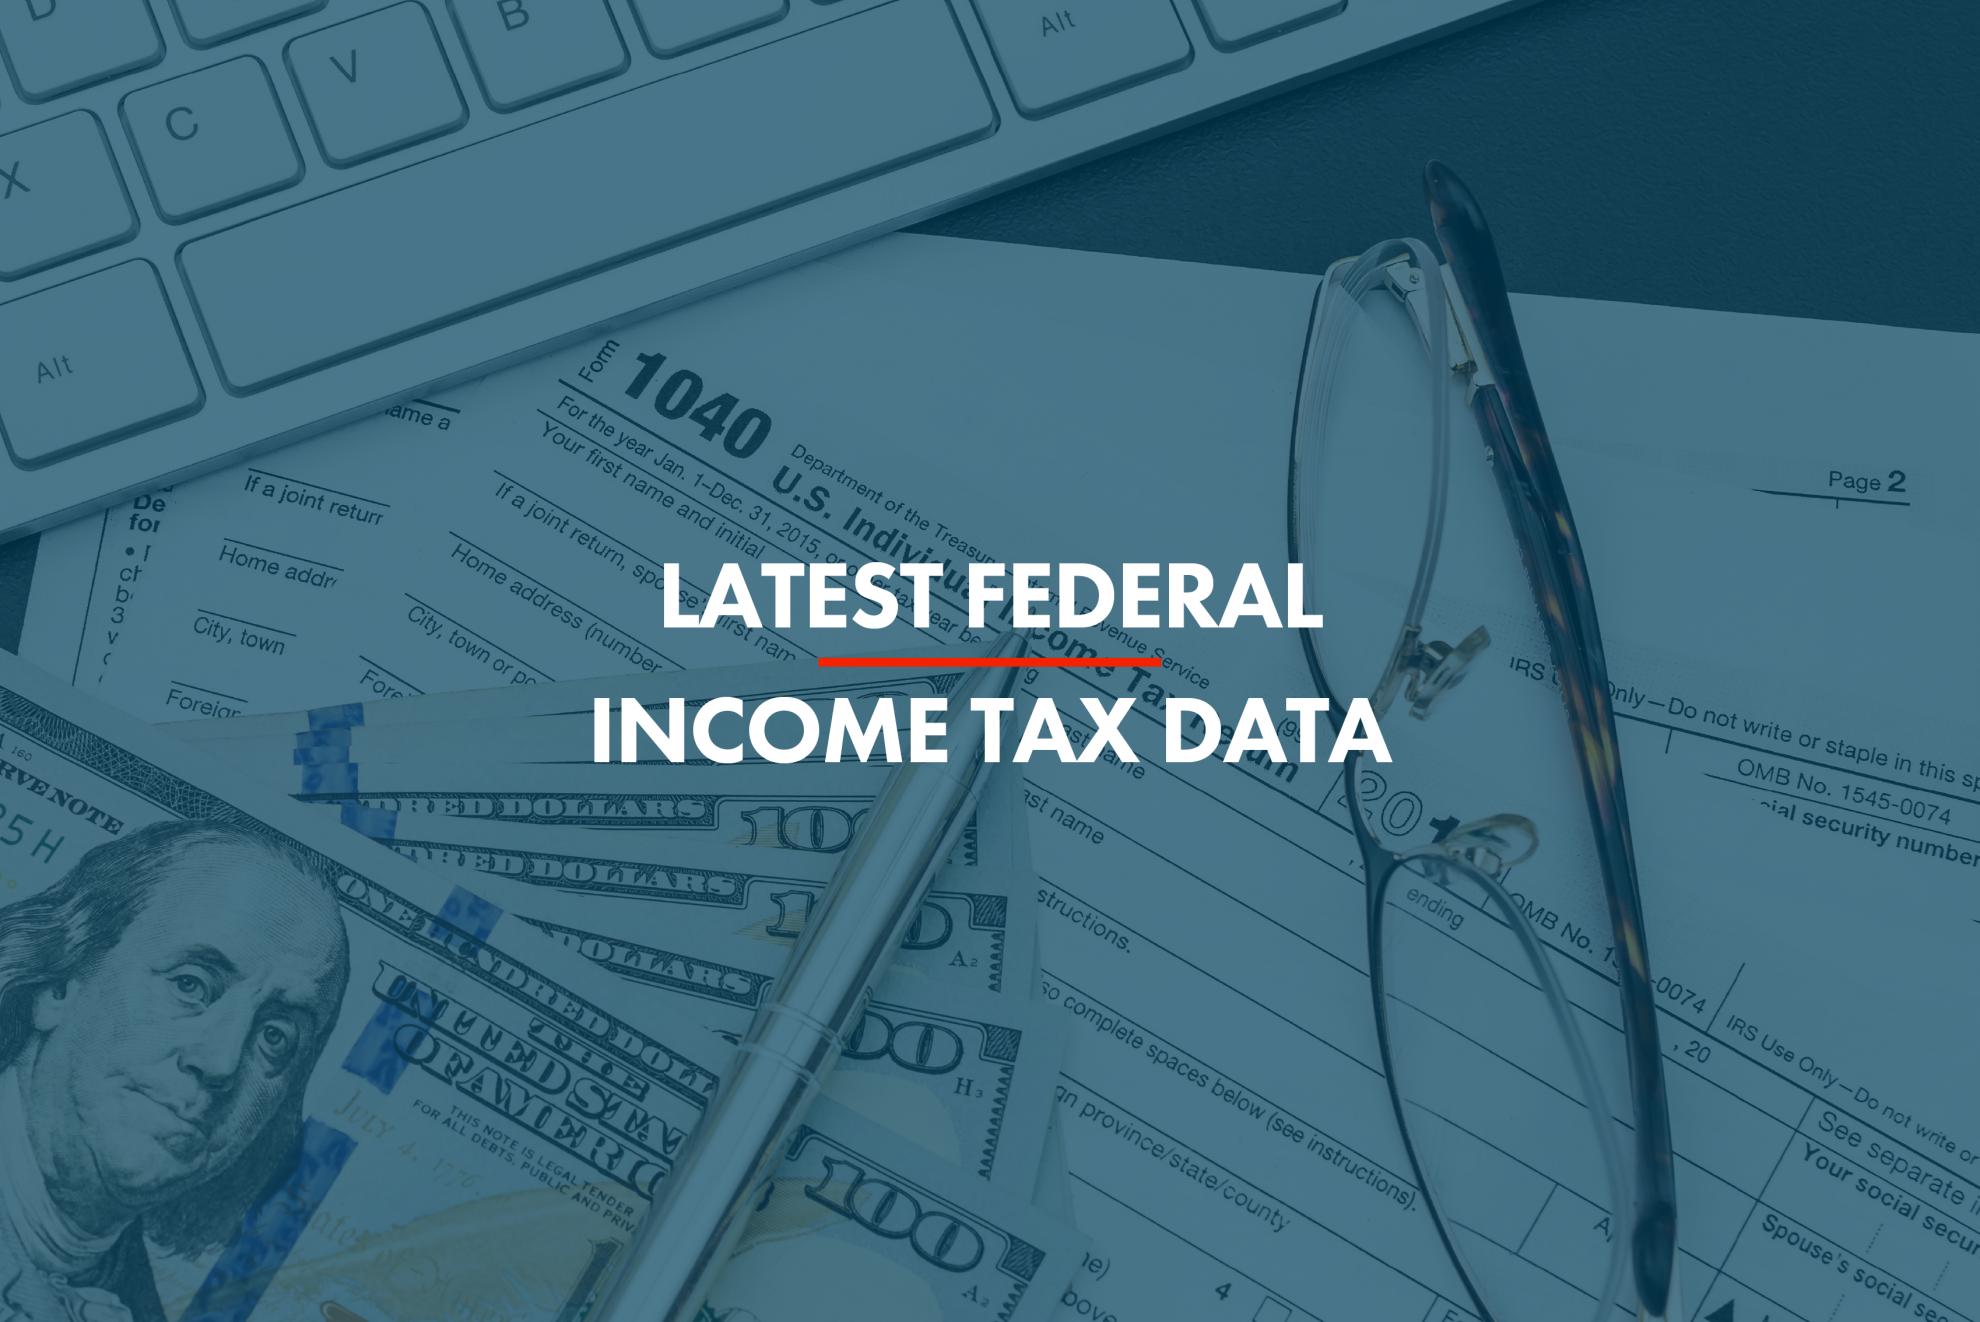 taxfoundation.org